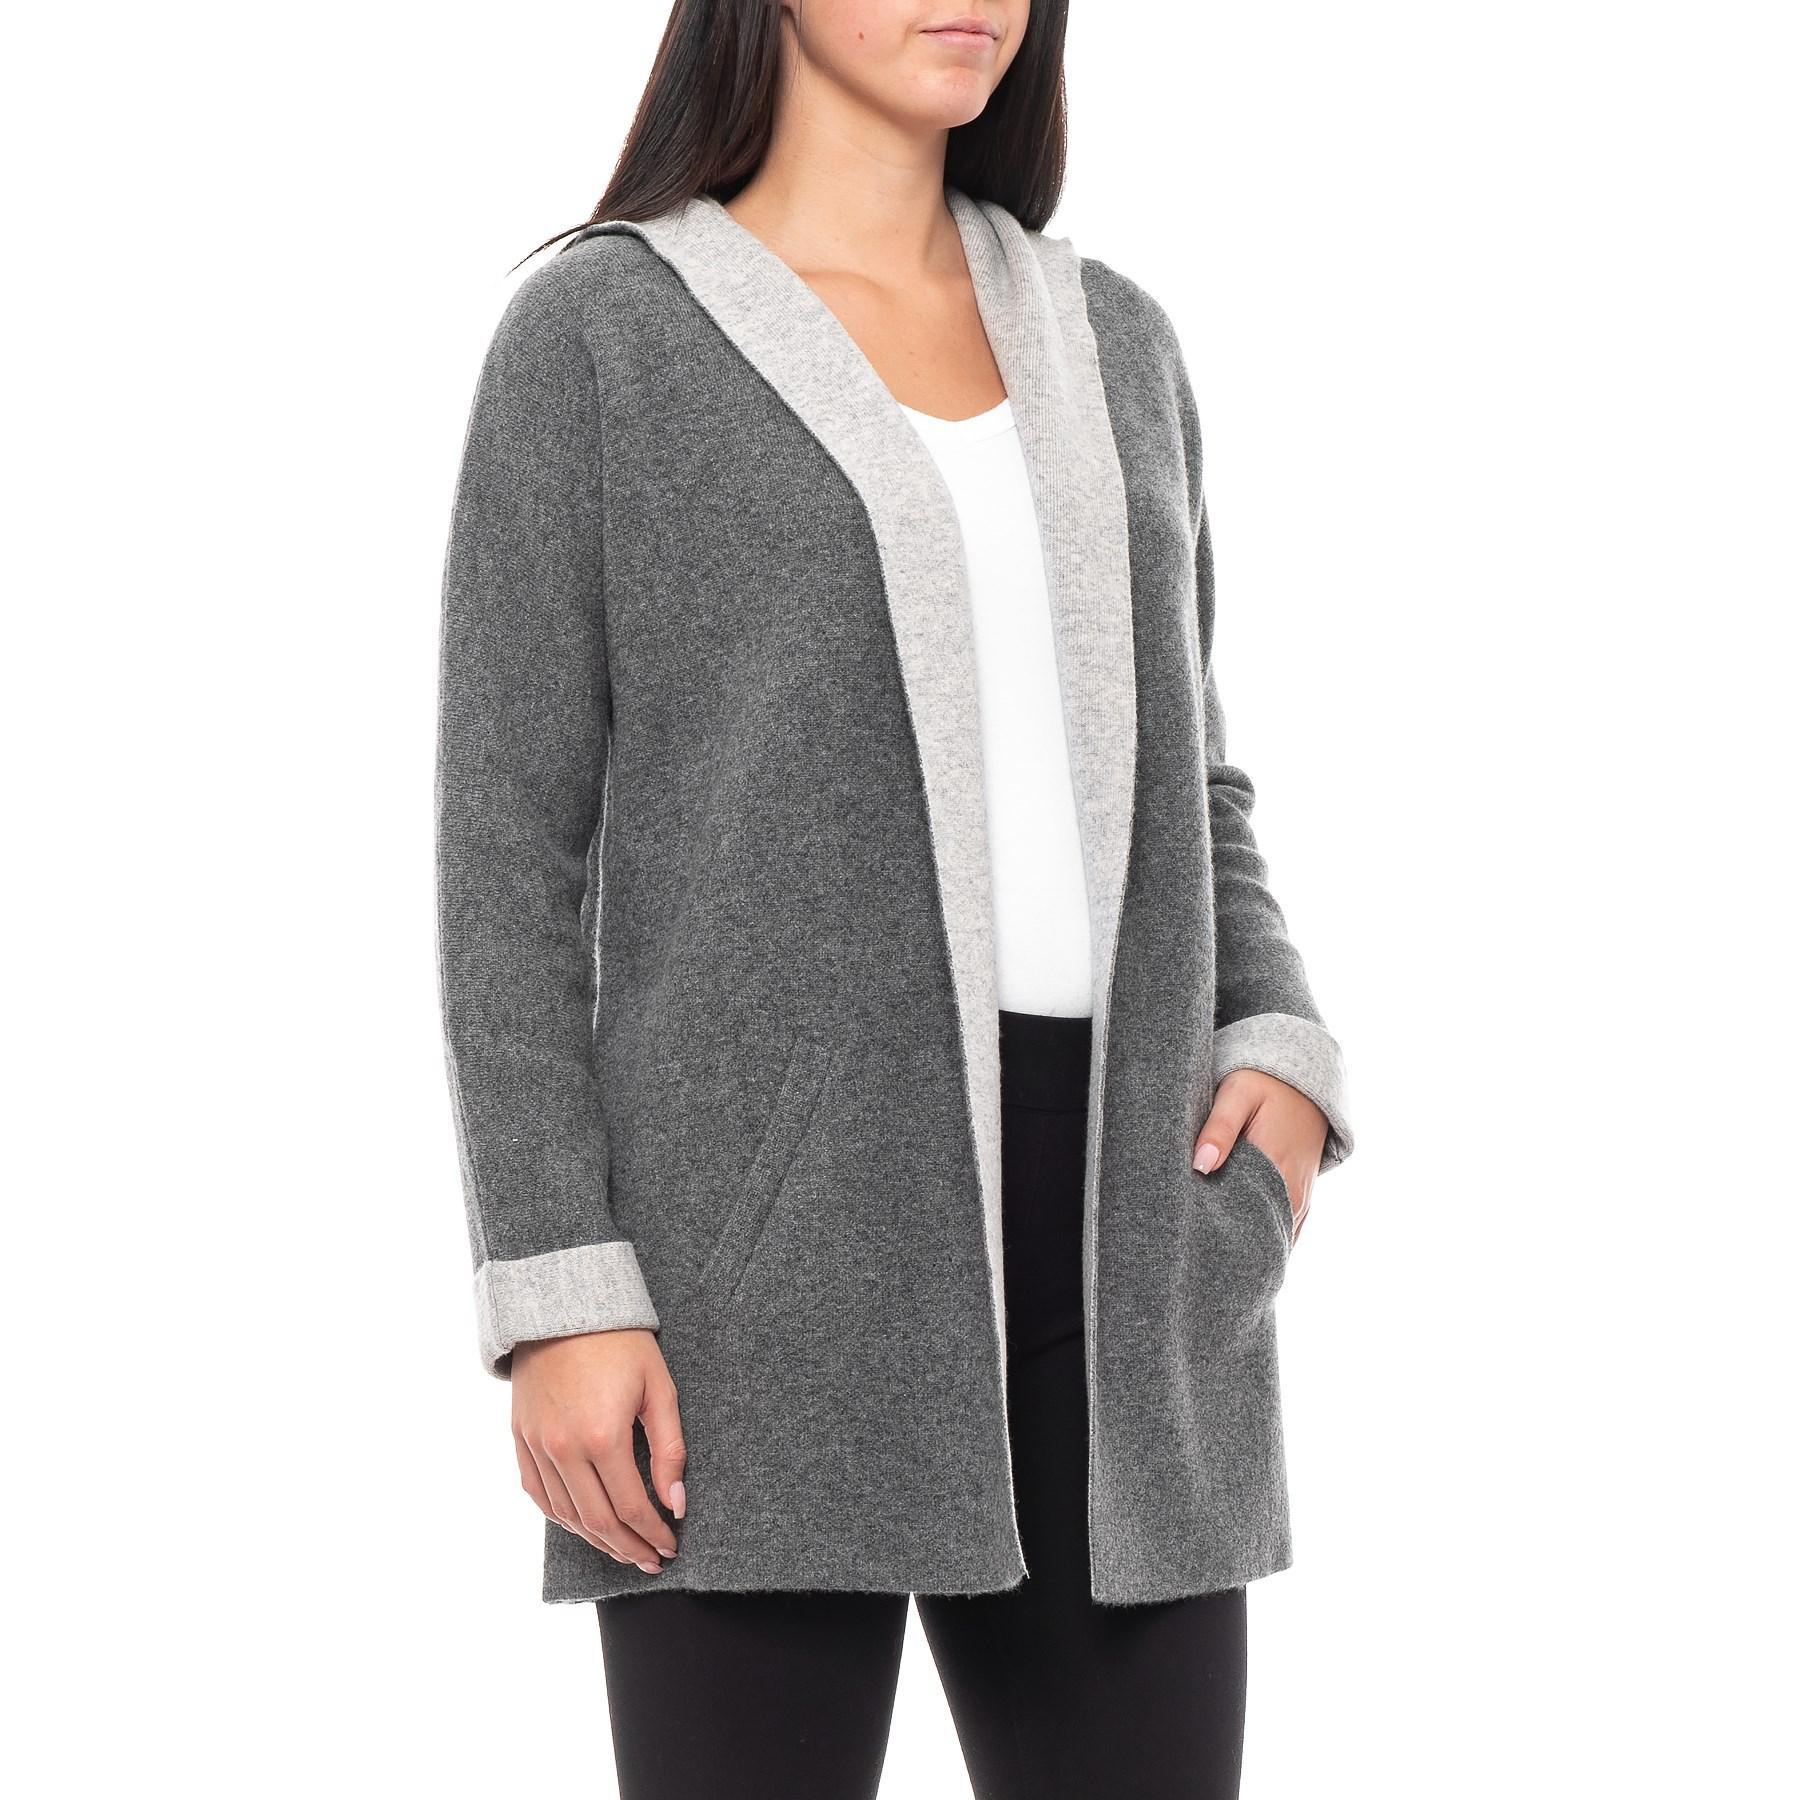 Lyst - Koral Activewear Flash Speckled-print Hooded